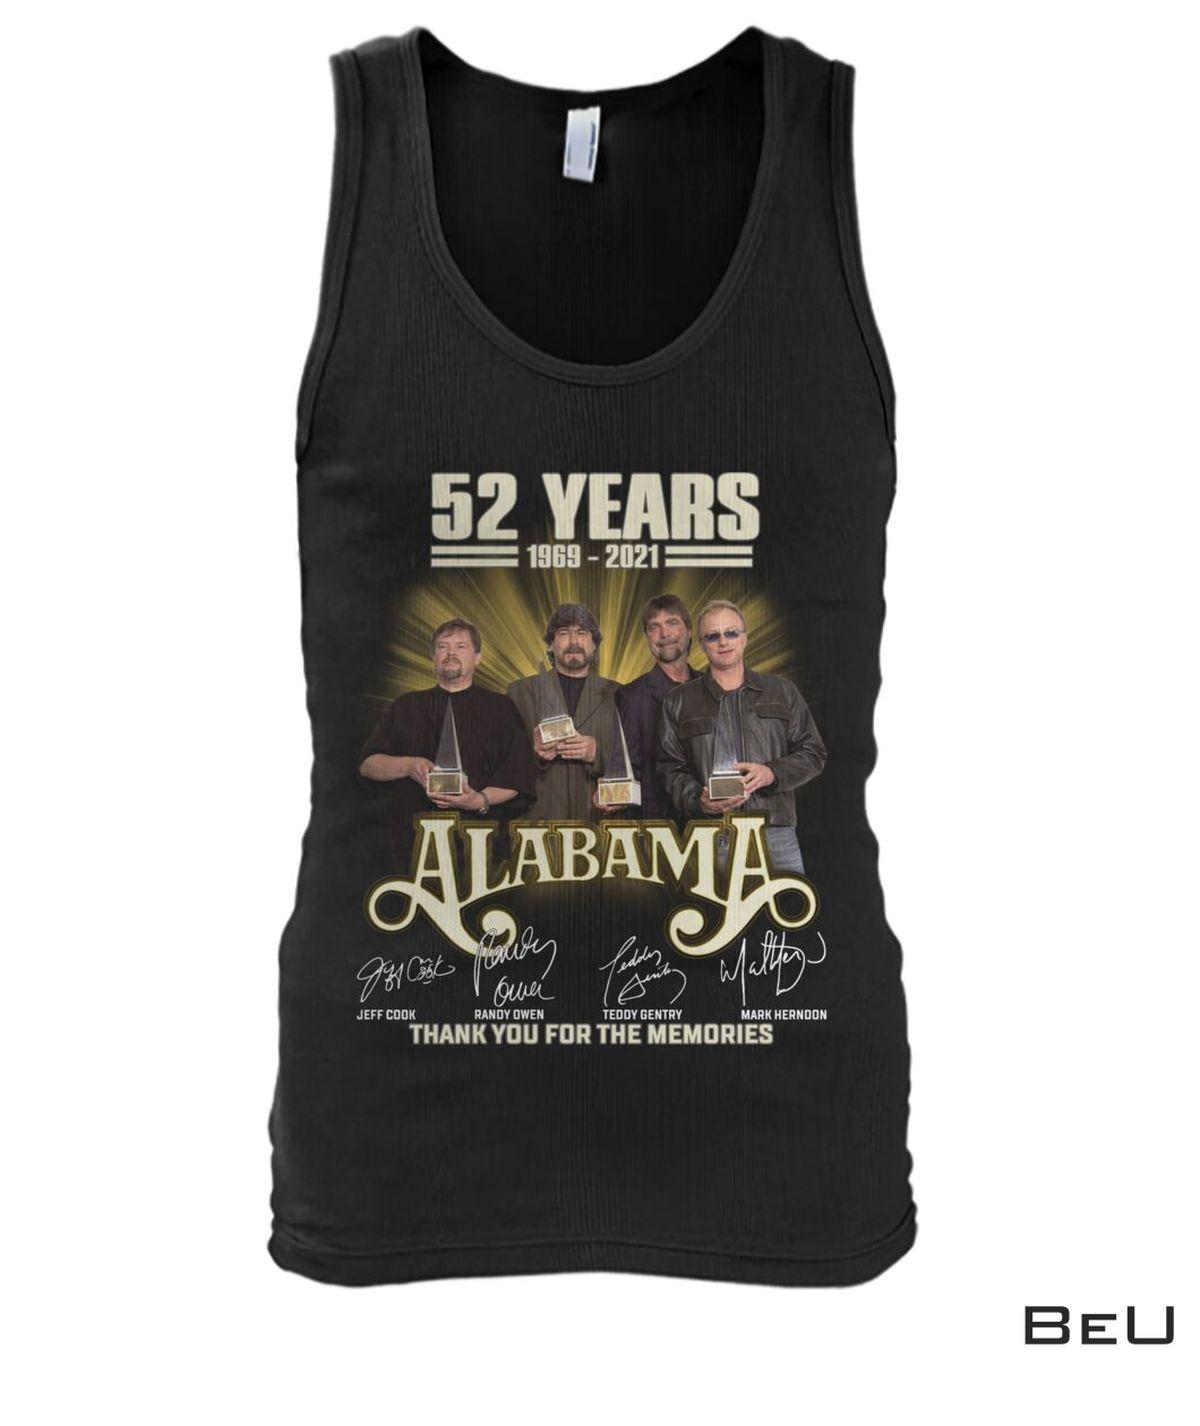 eBay Alabama 52 Years Thank You For The Memories Shirt, hoodie, tank top